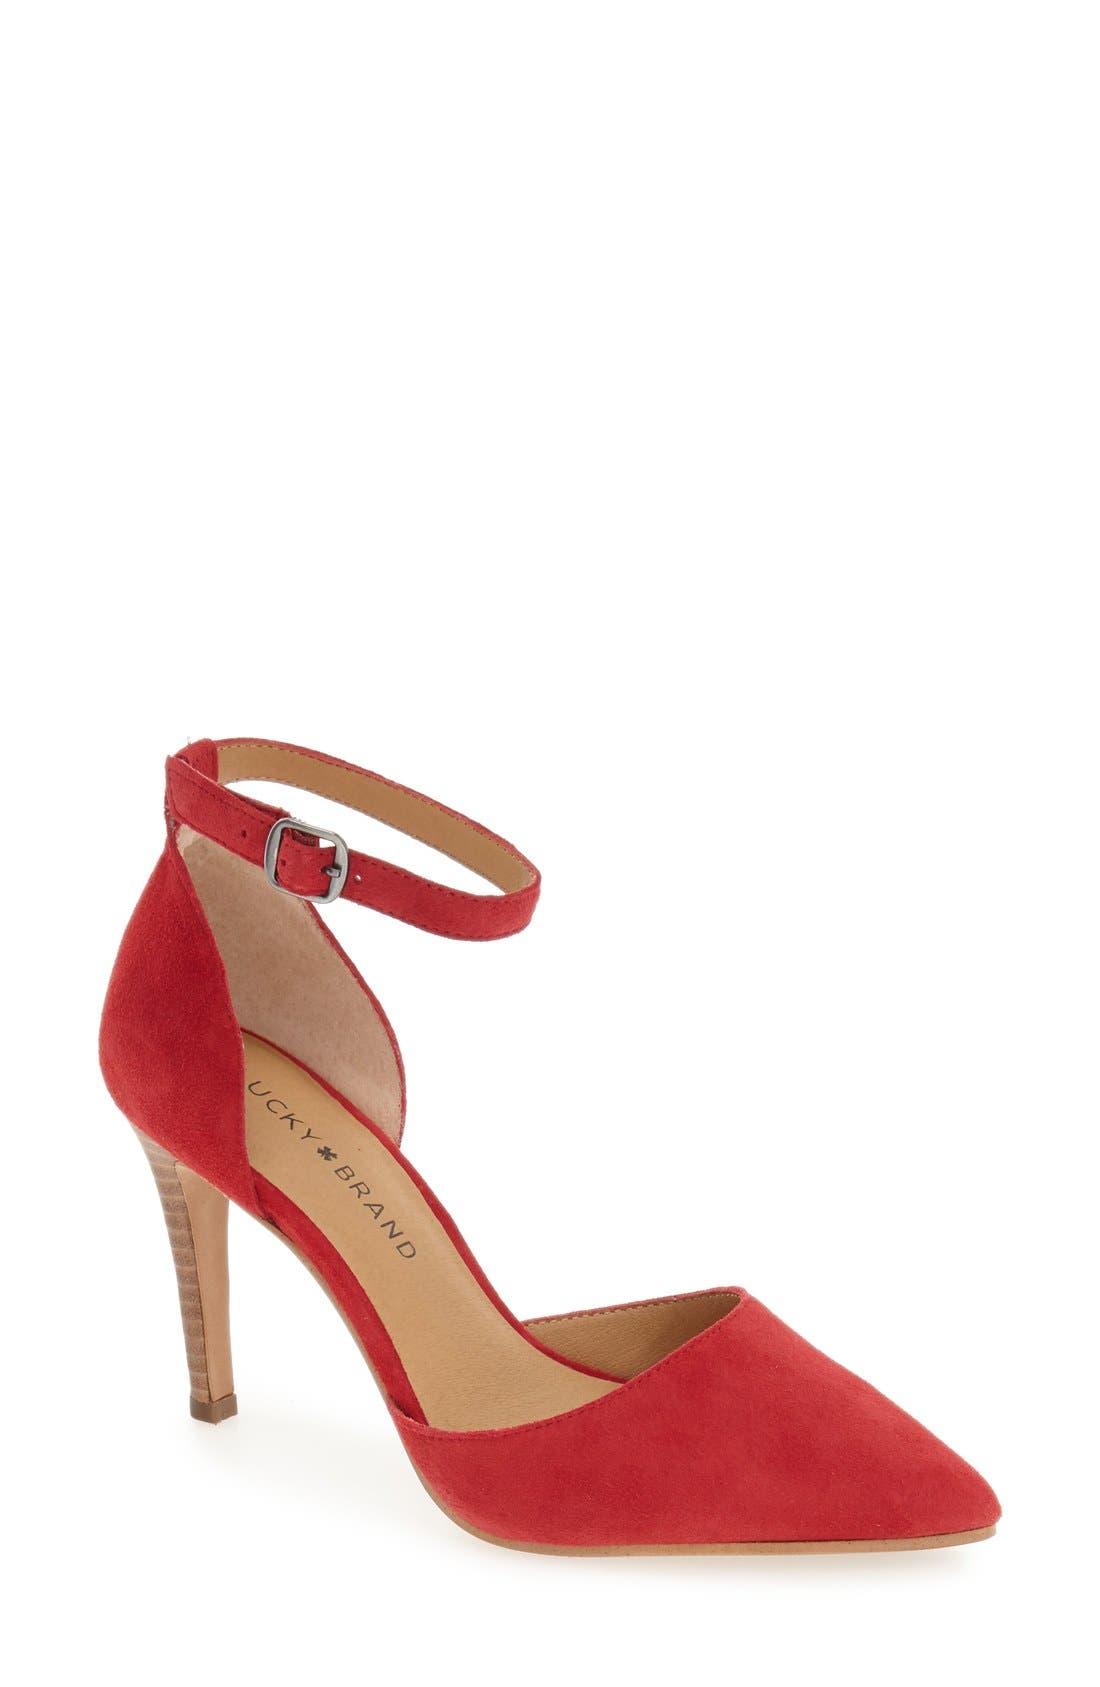 Main Image - Lucky Brand 'Tukko' d'Orsay Ankle Strap Pump (Women)